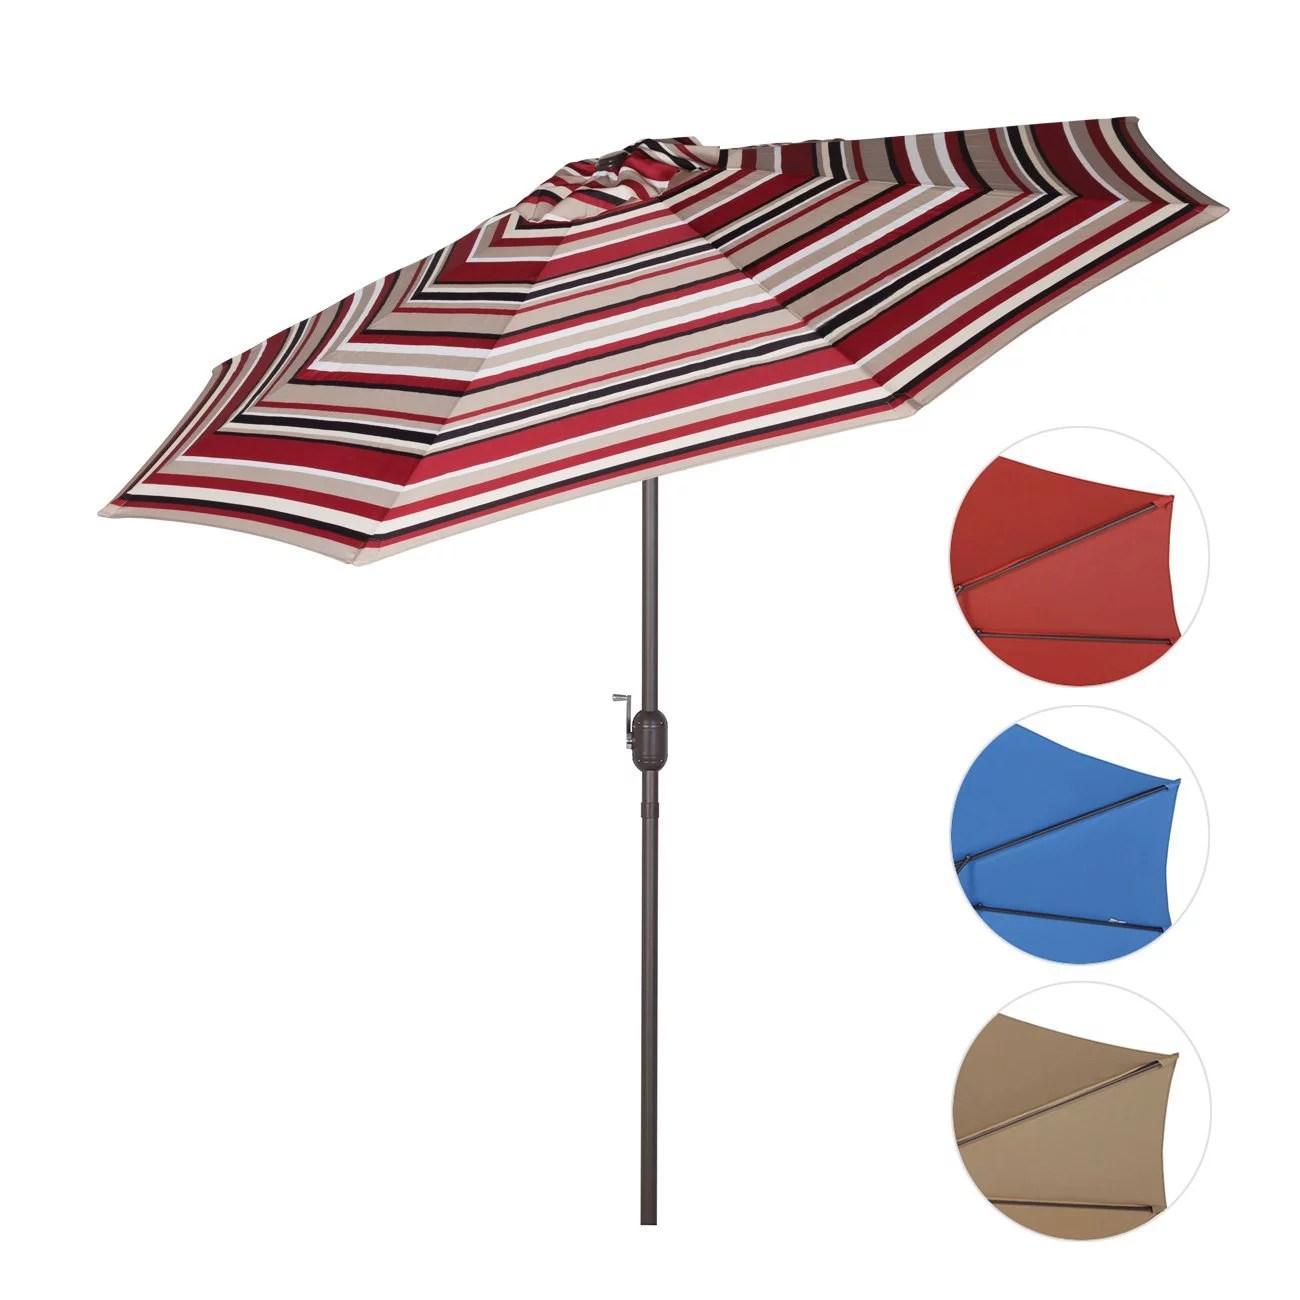 Sekey 9ft Outdoor Umbrella Red stripesPatio Umbrella Red